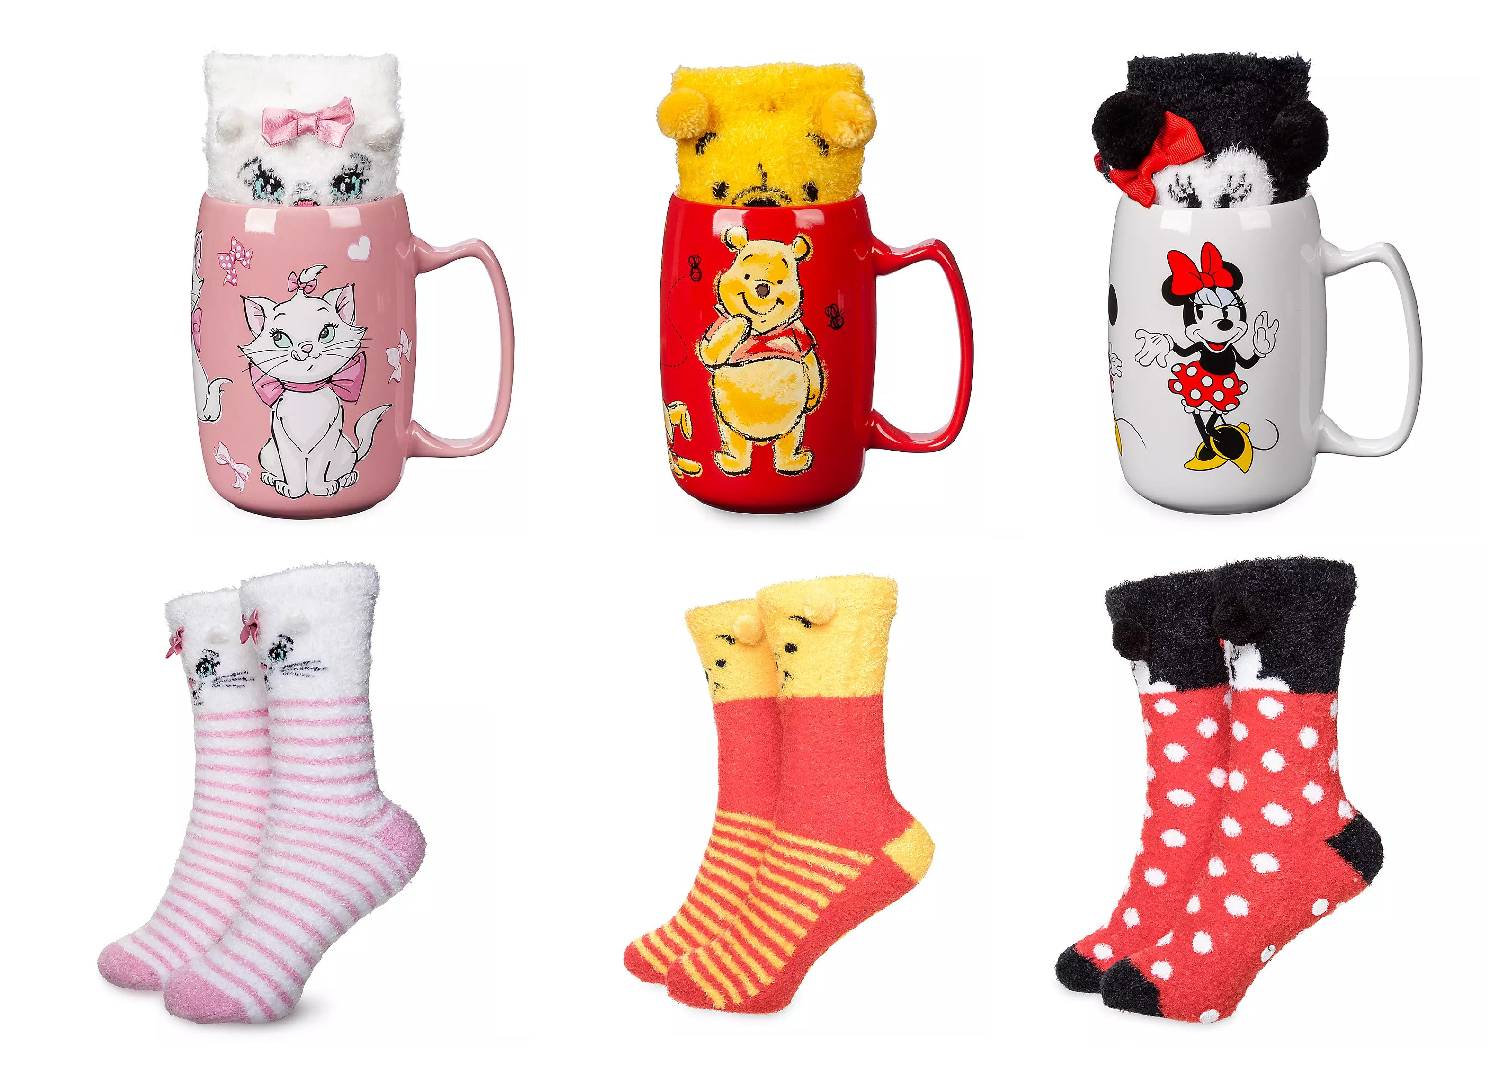 Disney Store Coffee Mug Socks Marie Winnie the Pooh Minnie Mouse 2019 New - $69.95